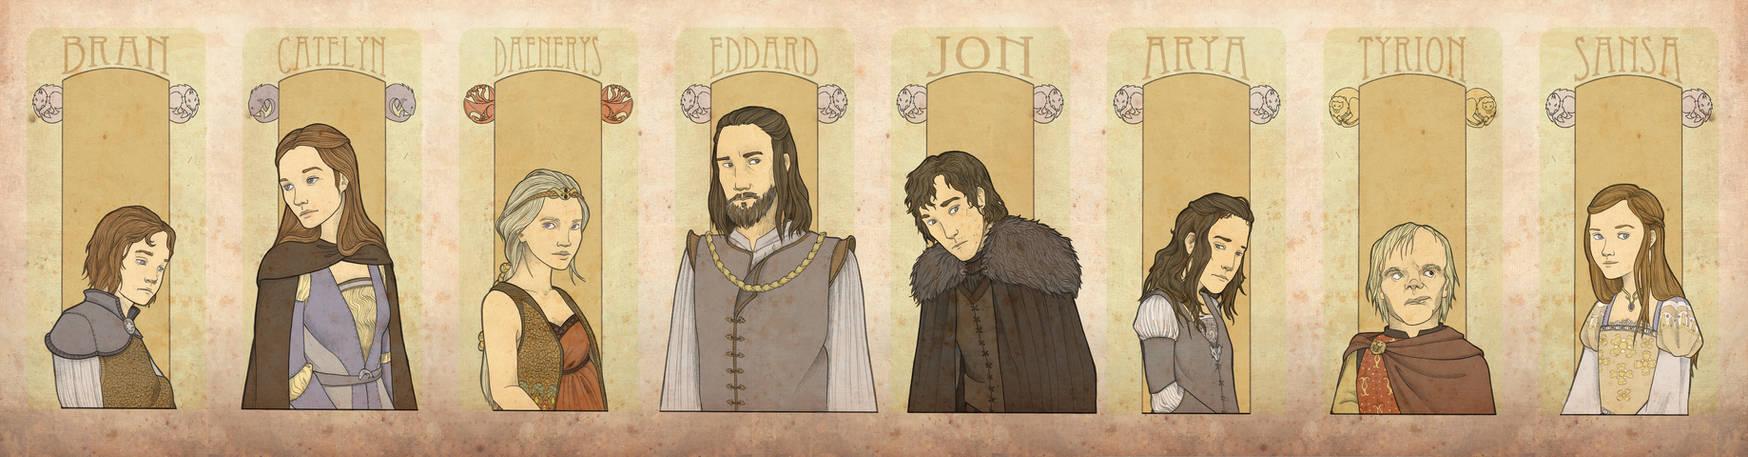 A Game of Thrones PoVs (v2) by mustamirri